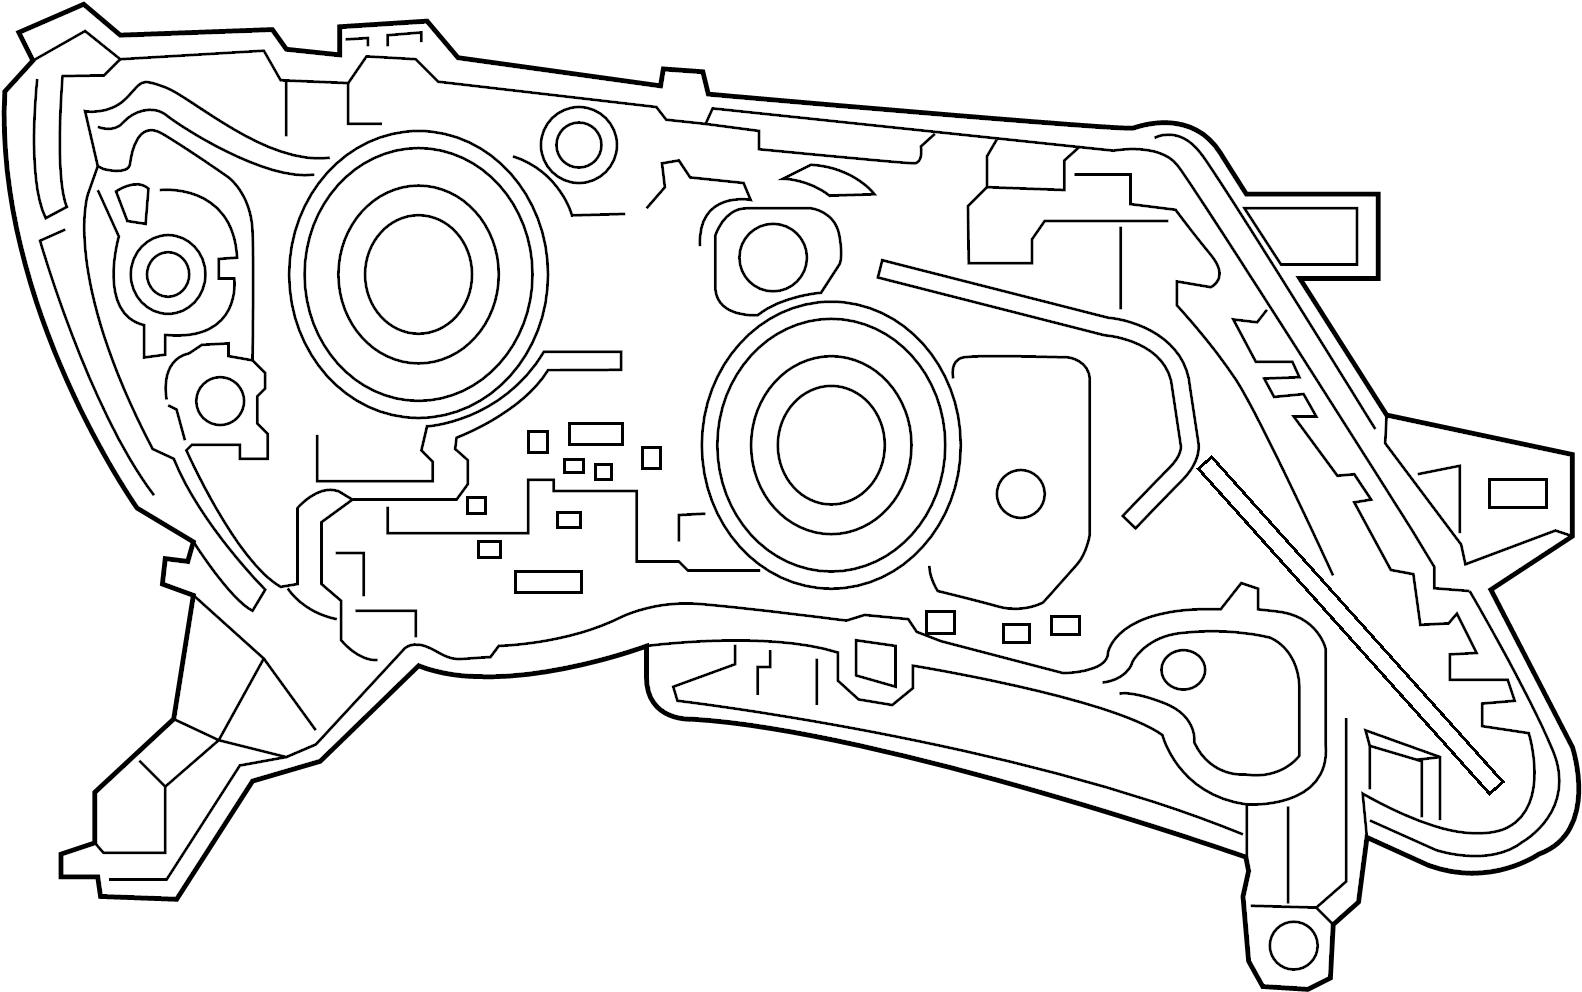 Nissan Pathfinder Headlight Assembly 19 Halogen